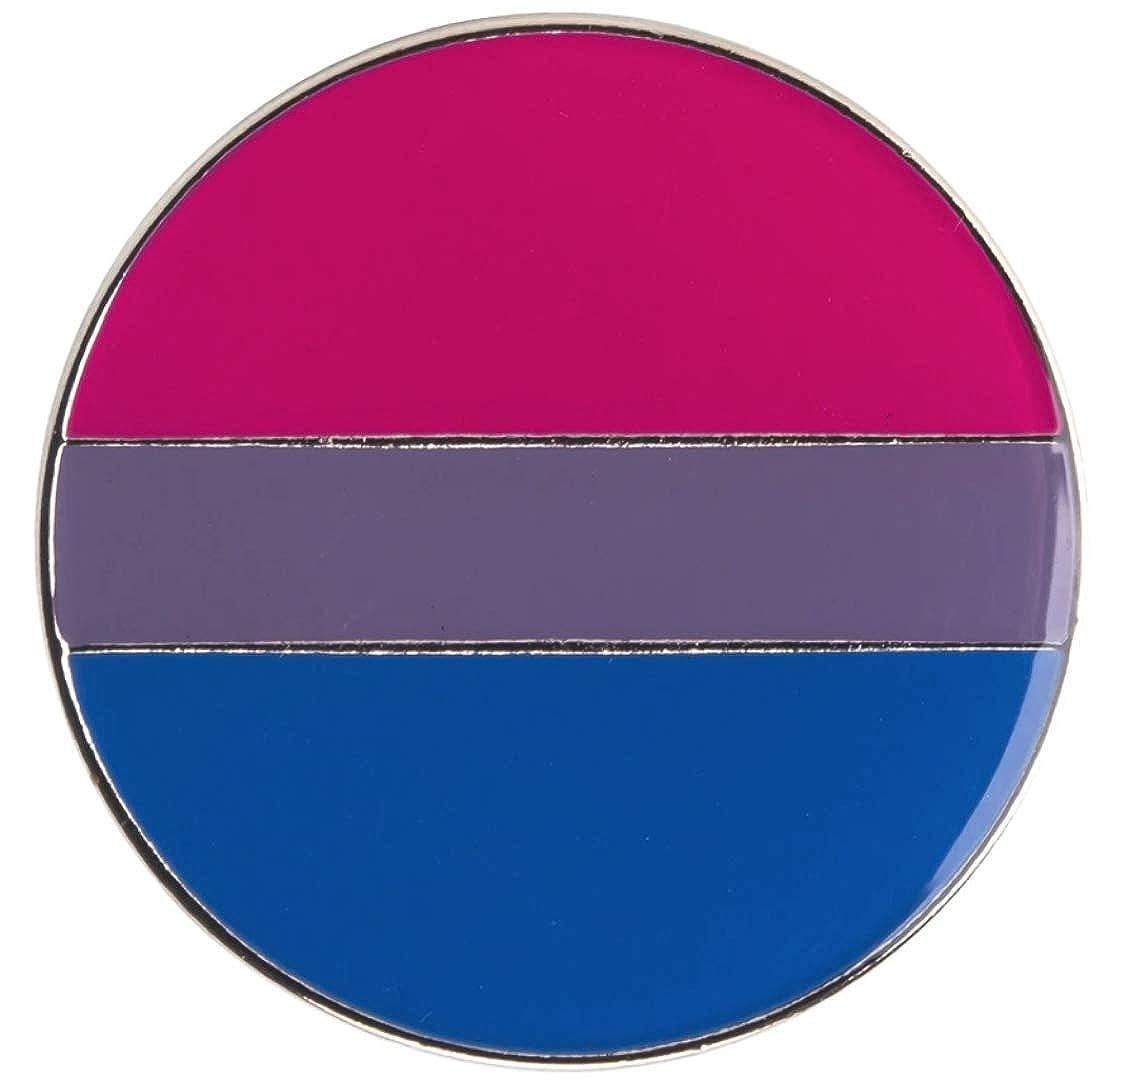 LGBTQ 1 Inch Bisexual Flag Round Pride Lapel Pin